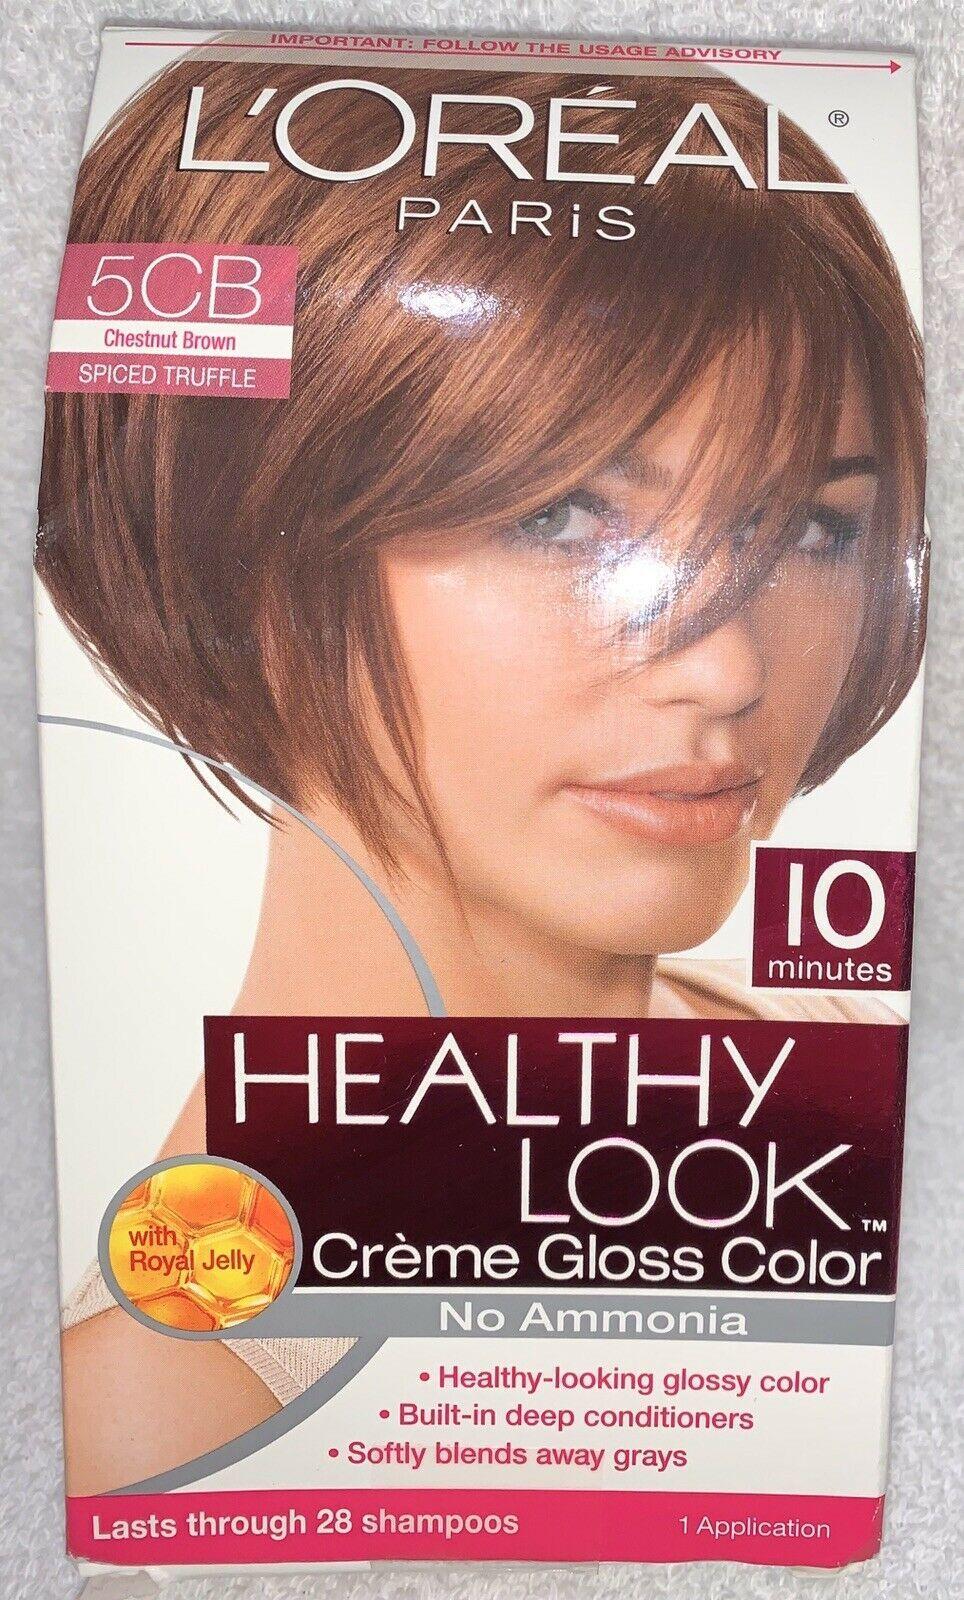 L'Oreal Paris 5CB SPICED TRUFFLE Chestnut Brown Creme Gloss Color Hair Dye New - $26.72